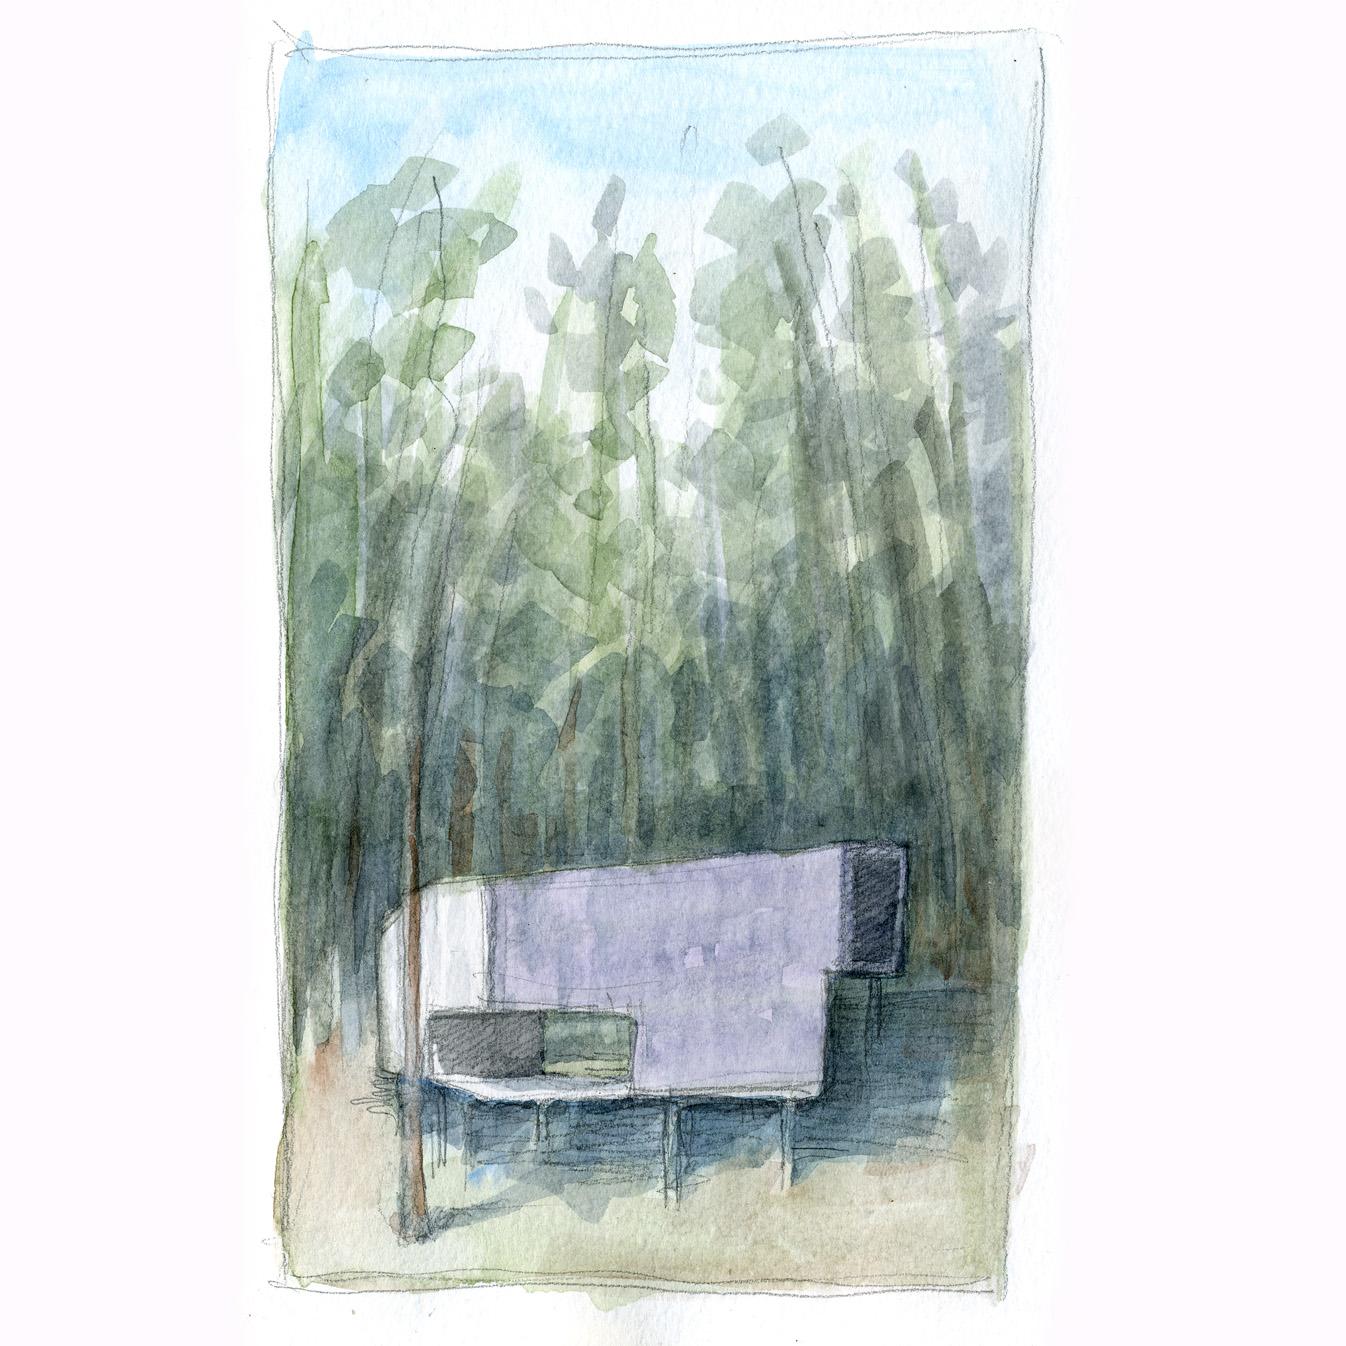 Keith Burt-proposal-watercolour_sq.jpg